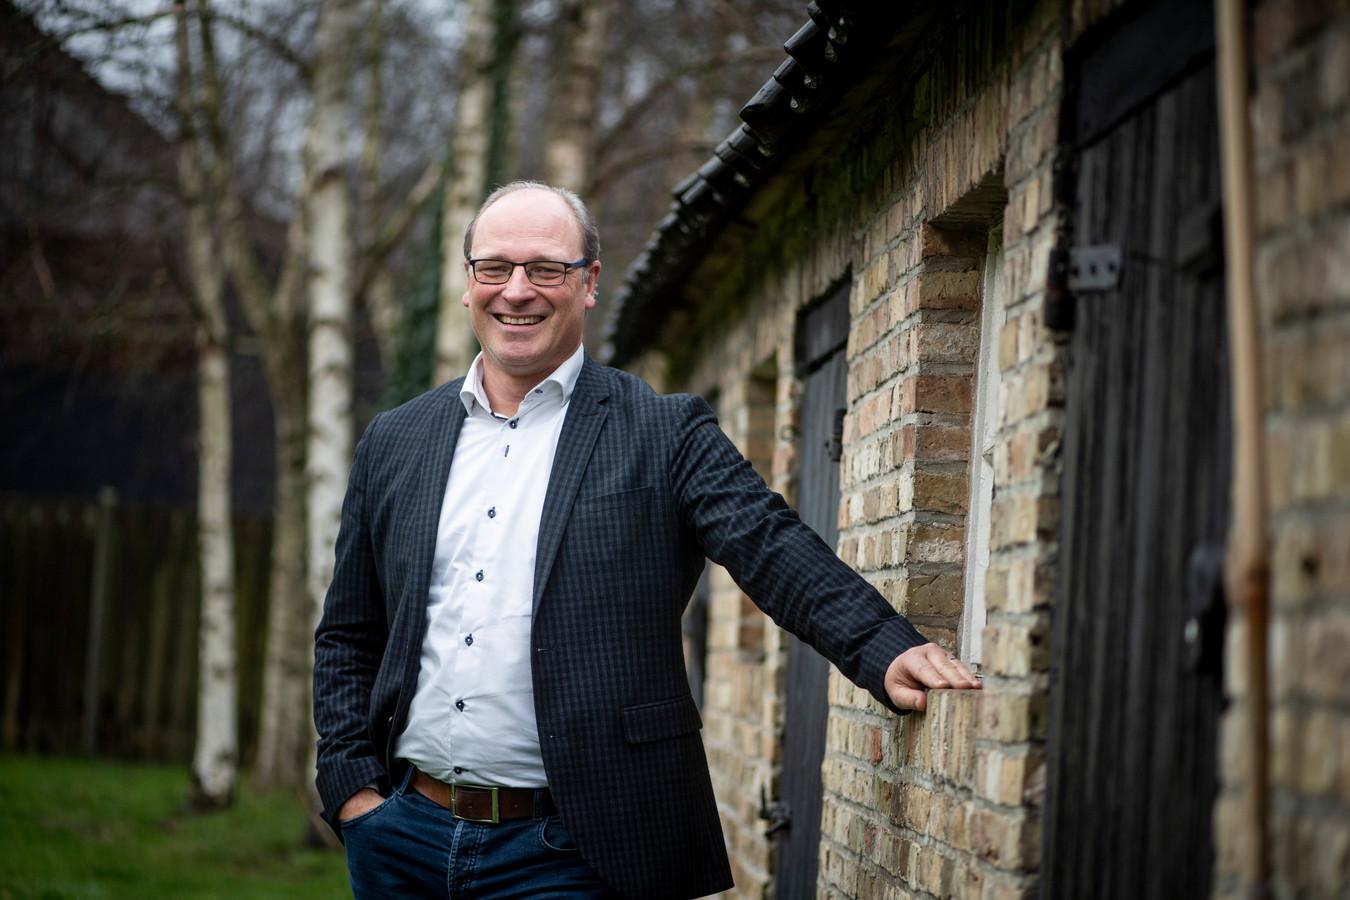 Gerjan Smelt stopt als raadslid van Twenterand.